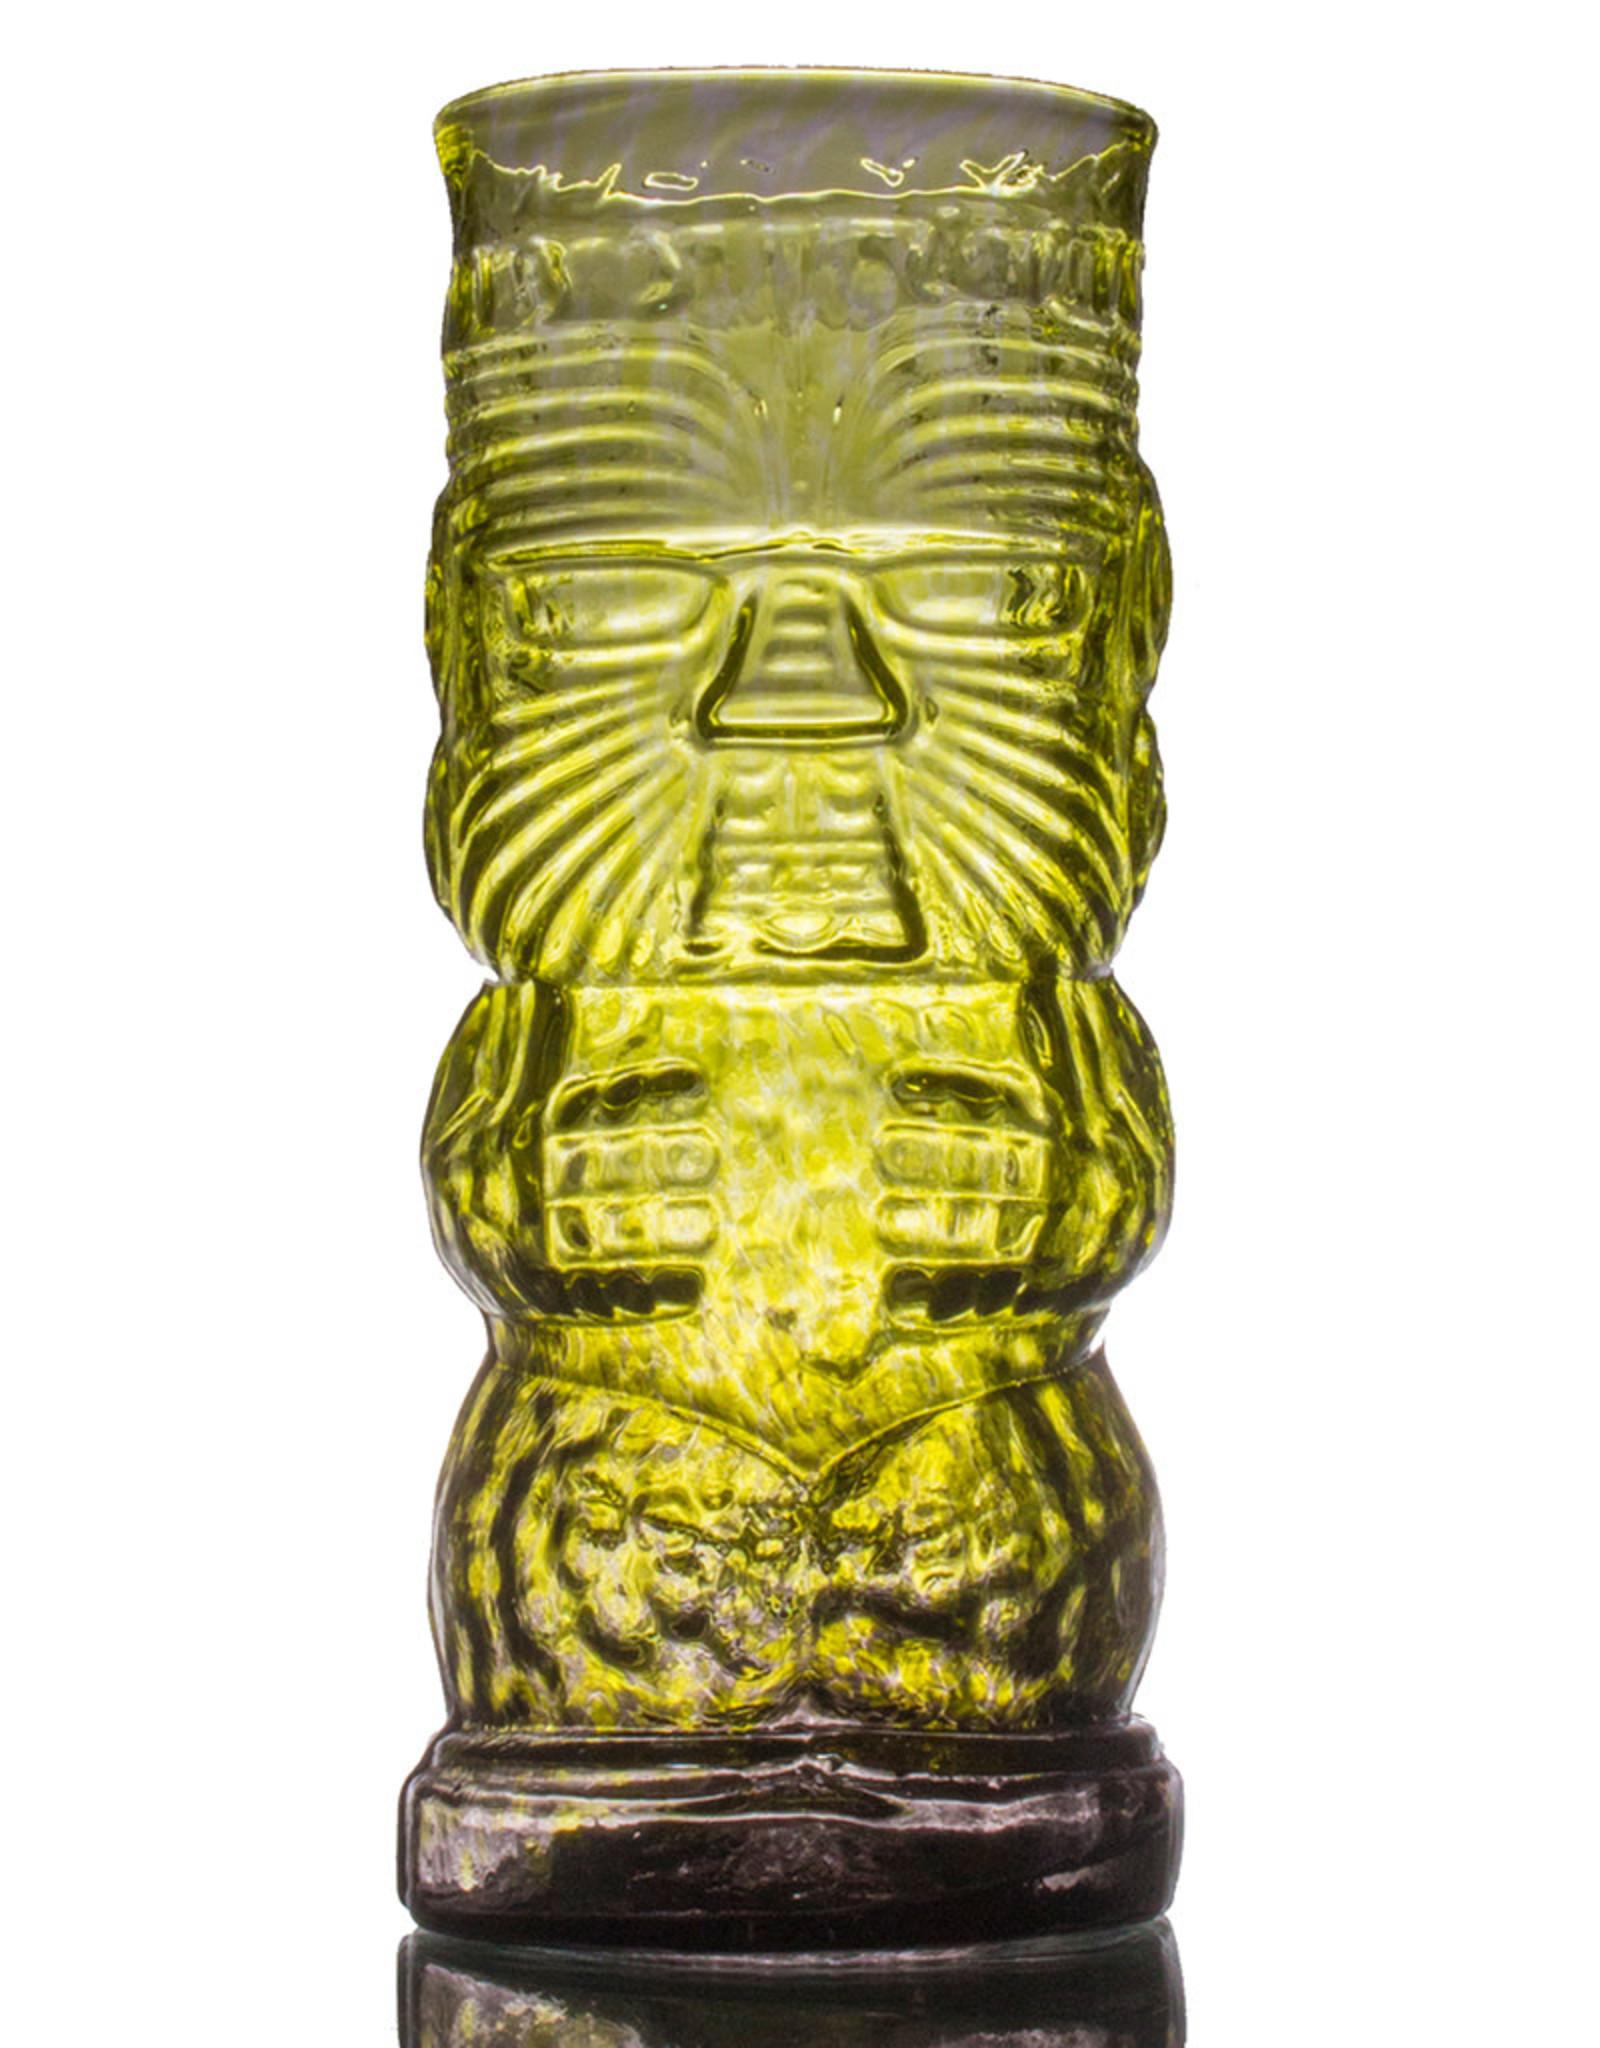 IANNAZZI GLASS DESIGN WARRIOR JUNGLE FOG GLASS TIKI MUG